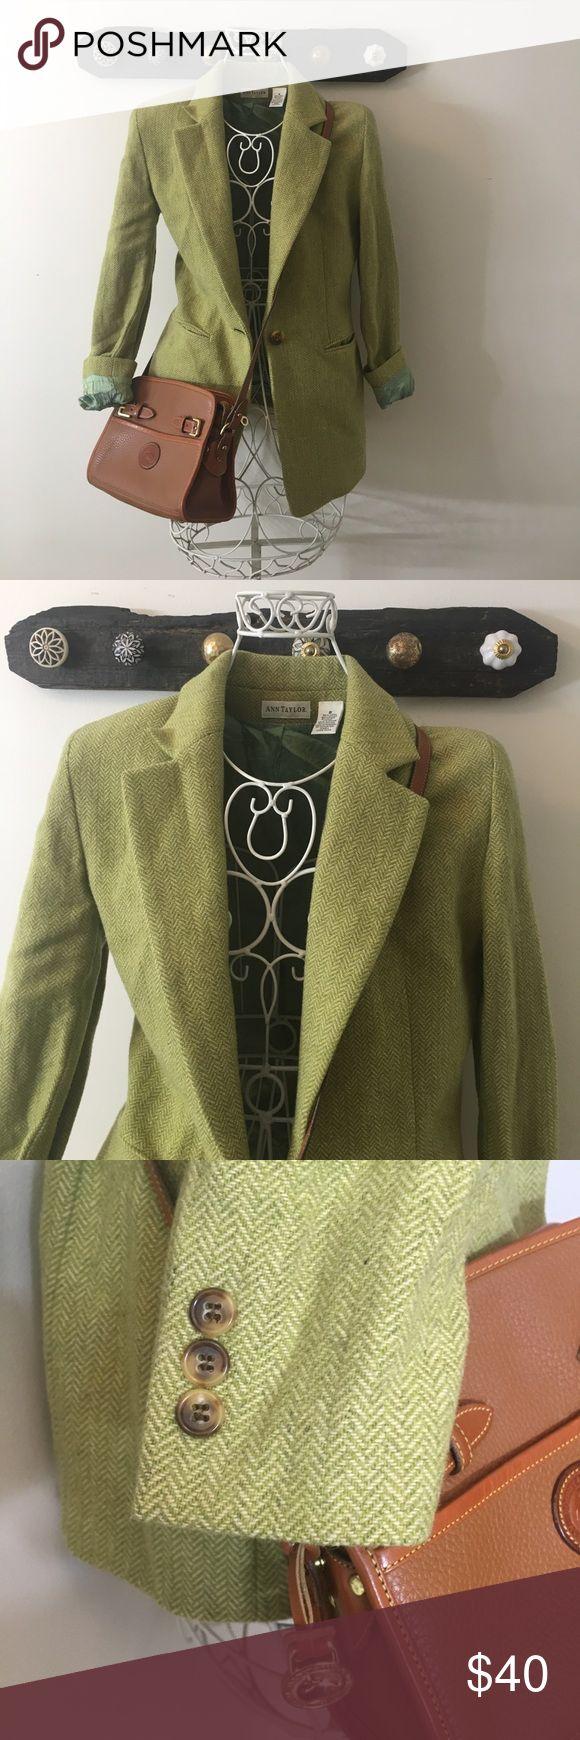 Ann Taylor Wool Blazer Gorgeous Chartreuse Green will Blazer by Ann Taylor. Lining is mint green and 💯 silk. Gorgeous Blazer for fall 2017! Ann Taylor Jackets & Coats Blazers